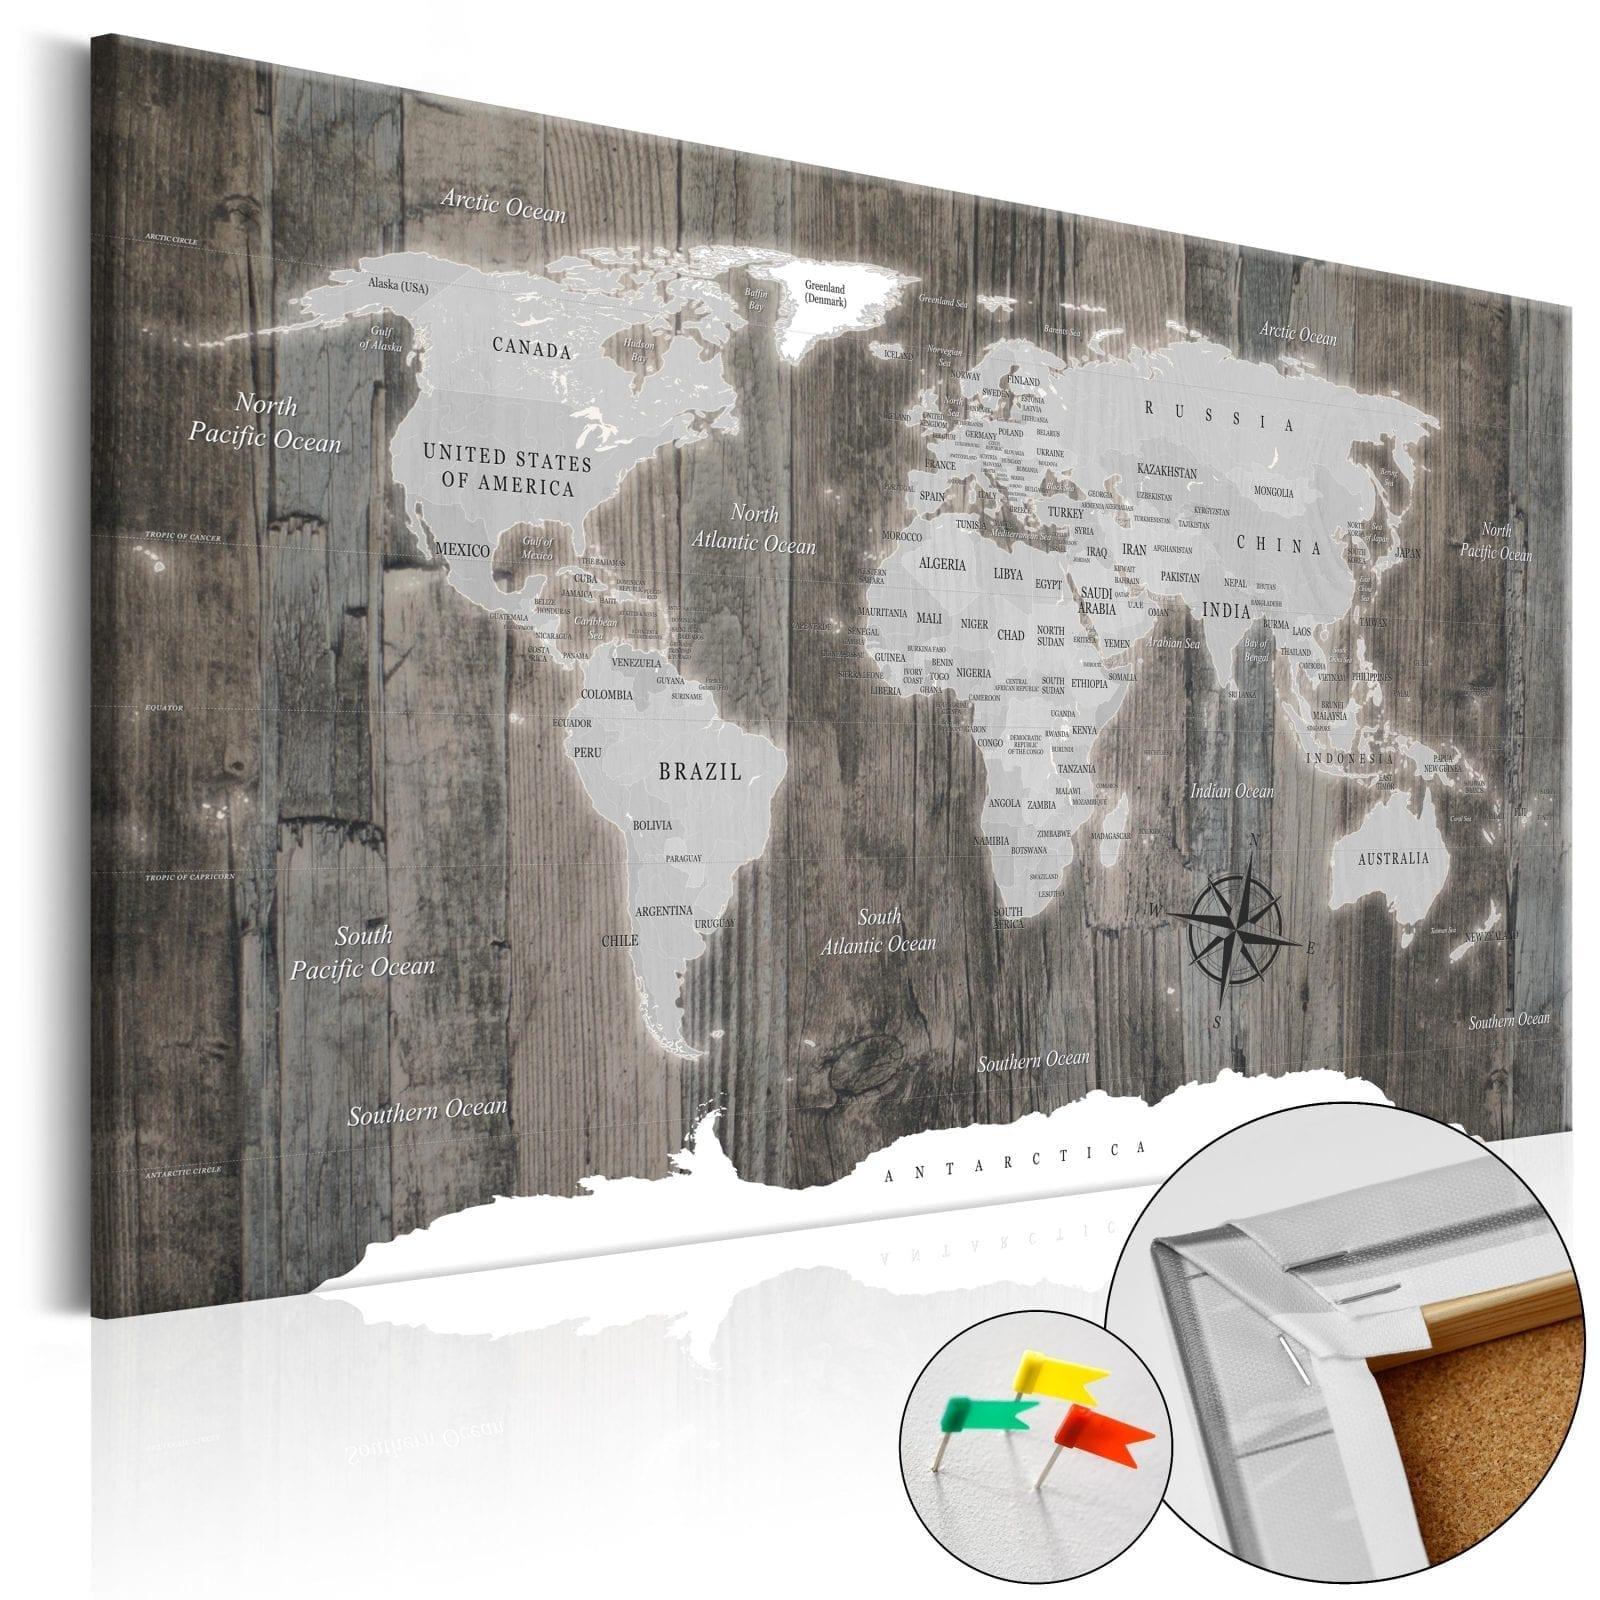 Tablero de corcho - World of Wood 1 | Potspintura.com